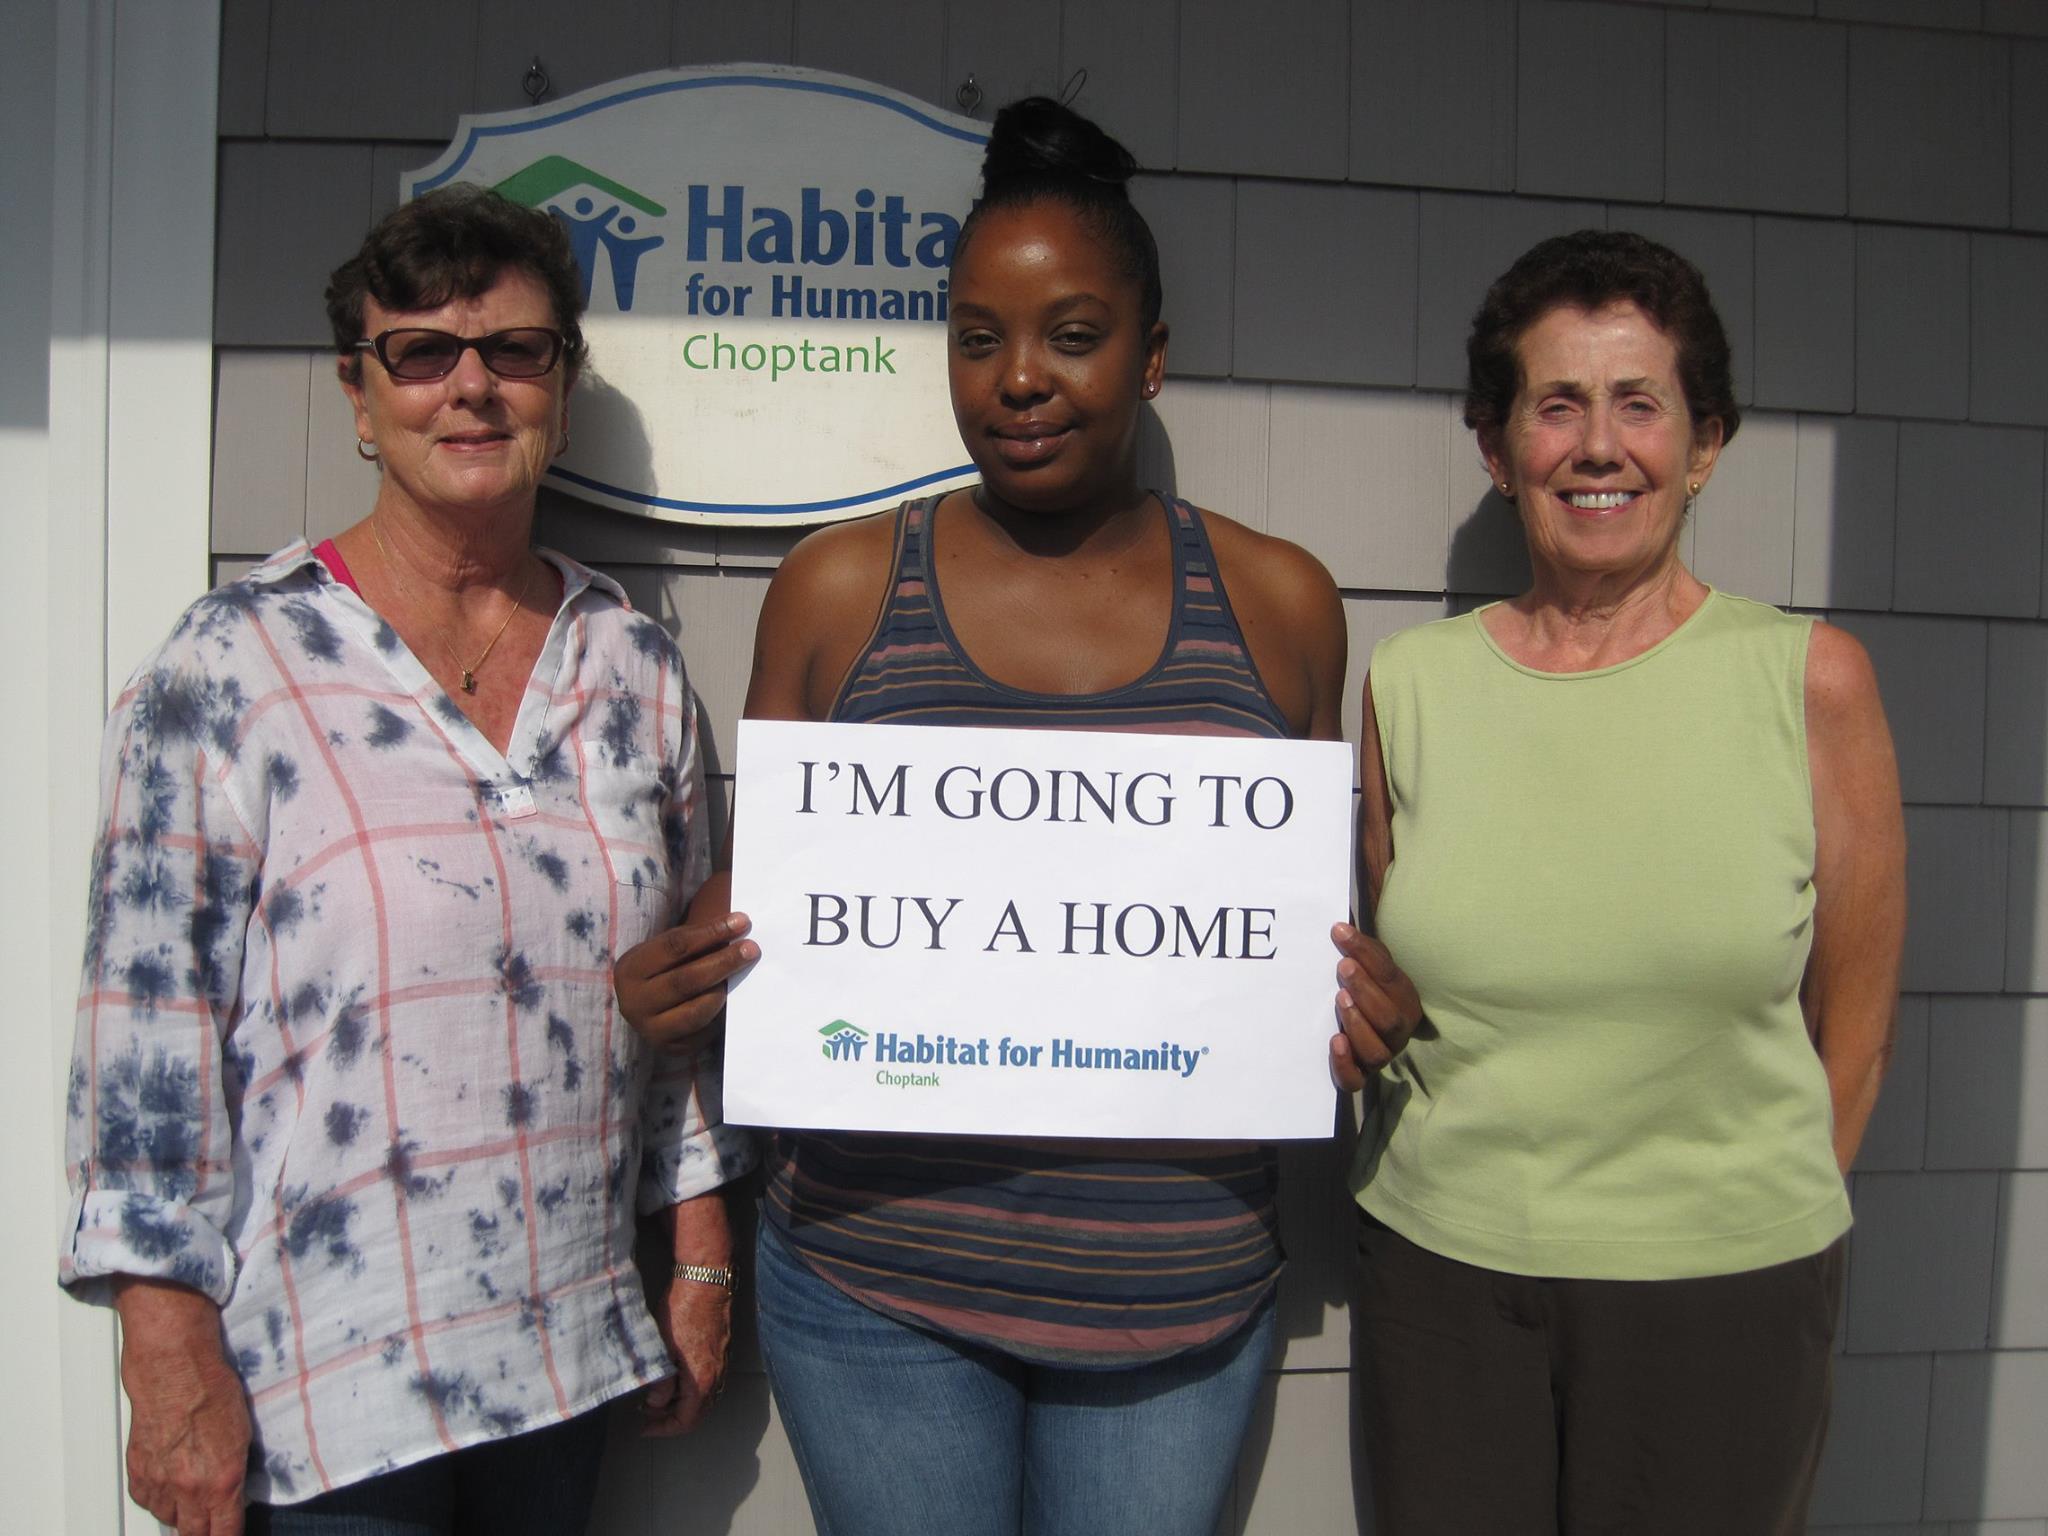 Londonderry employees become Habitat homebuyers